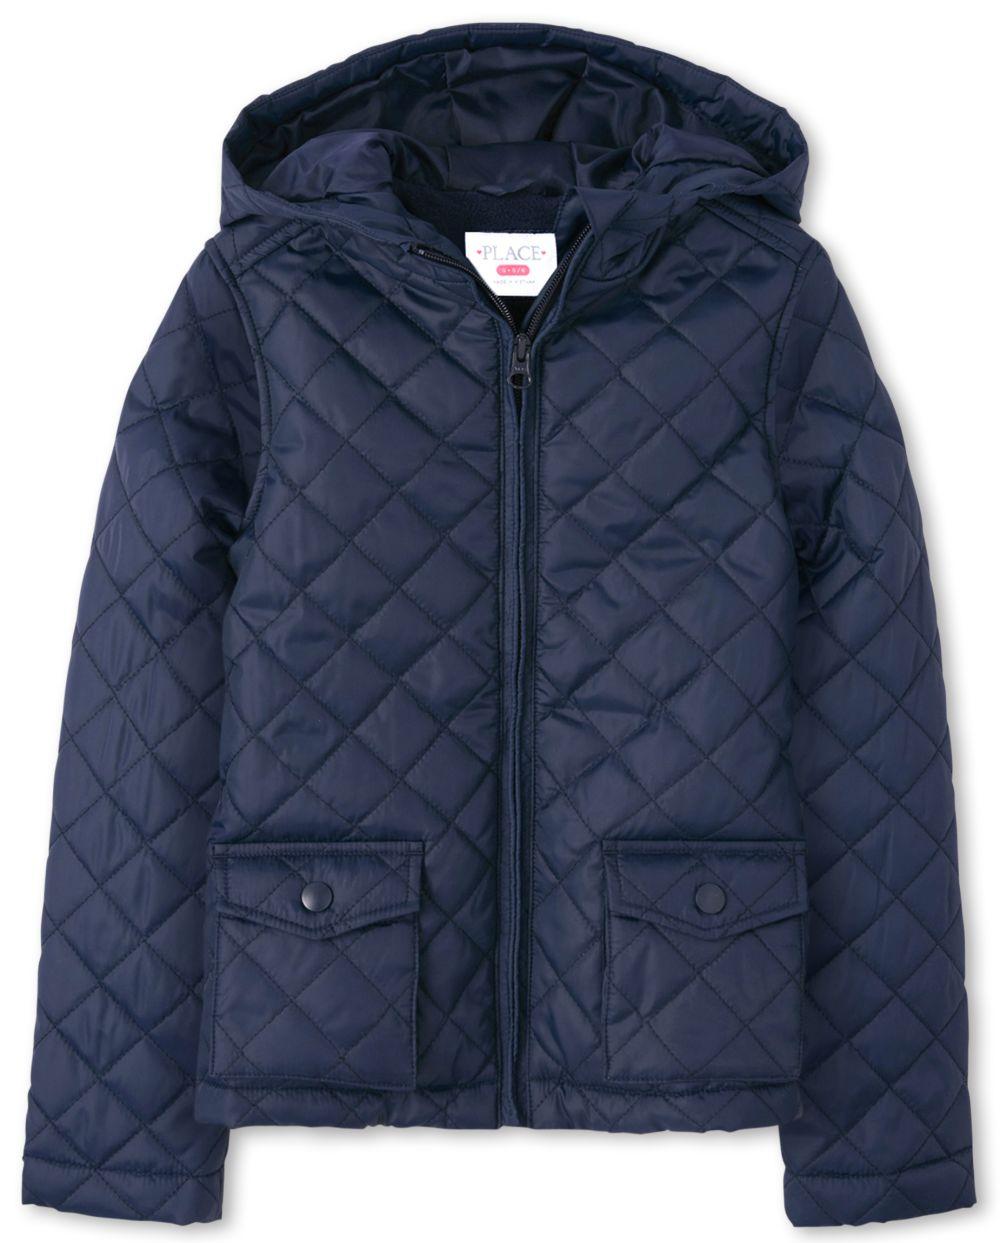 Girls Uniform Quilted Puffer Jacket